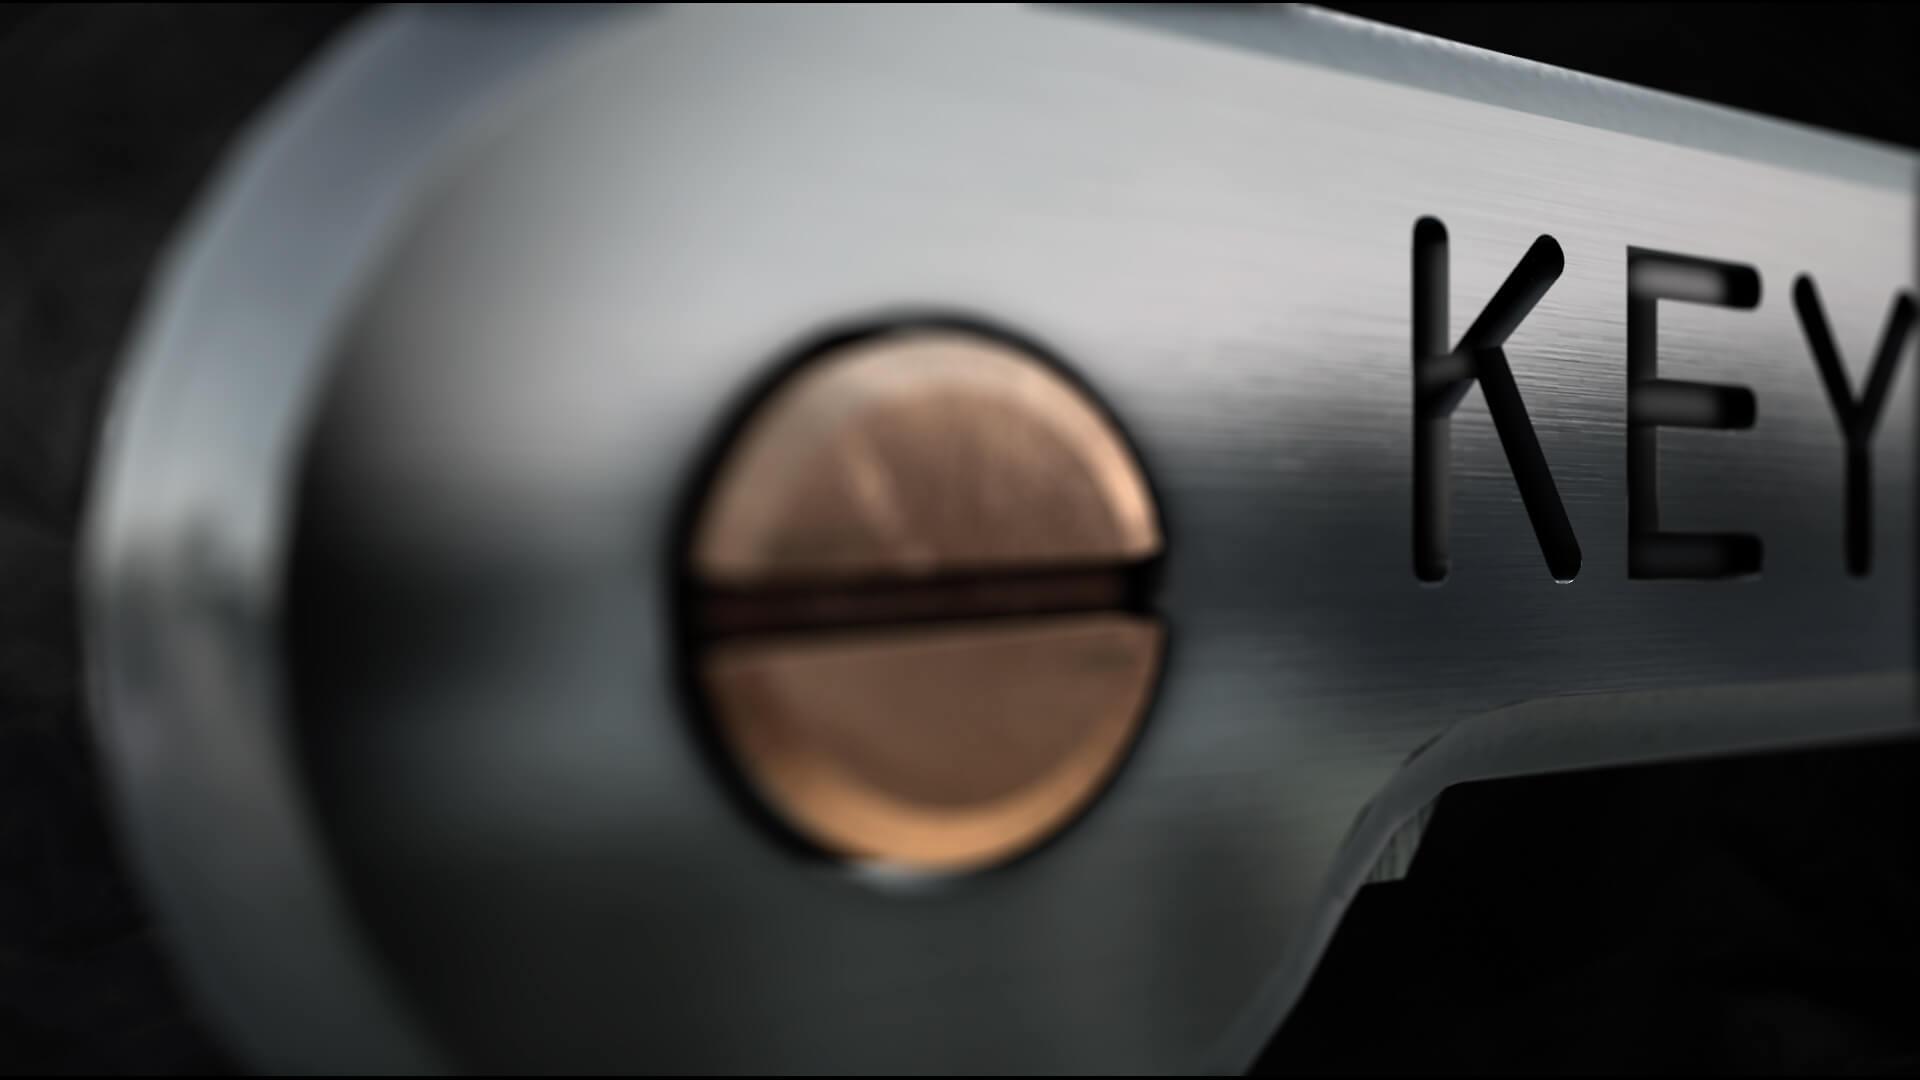 Keybar-Video-1920x1080